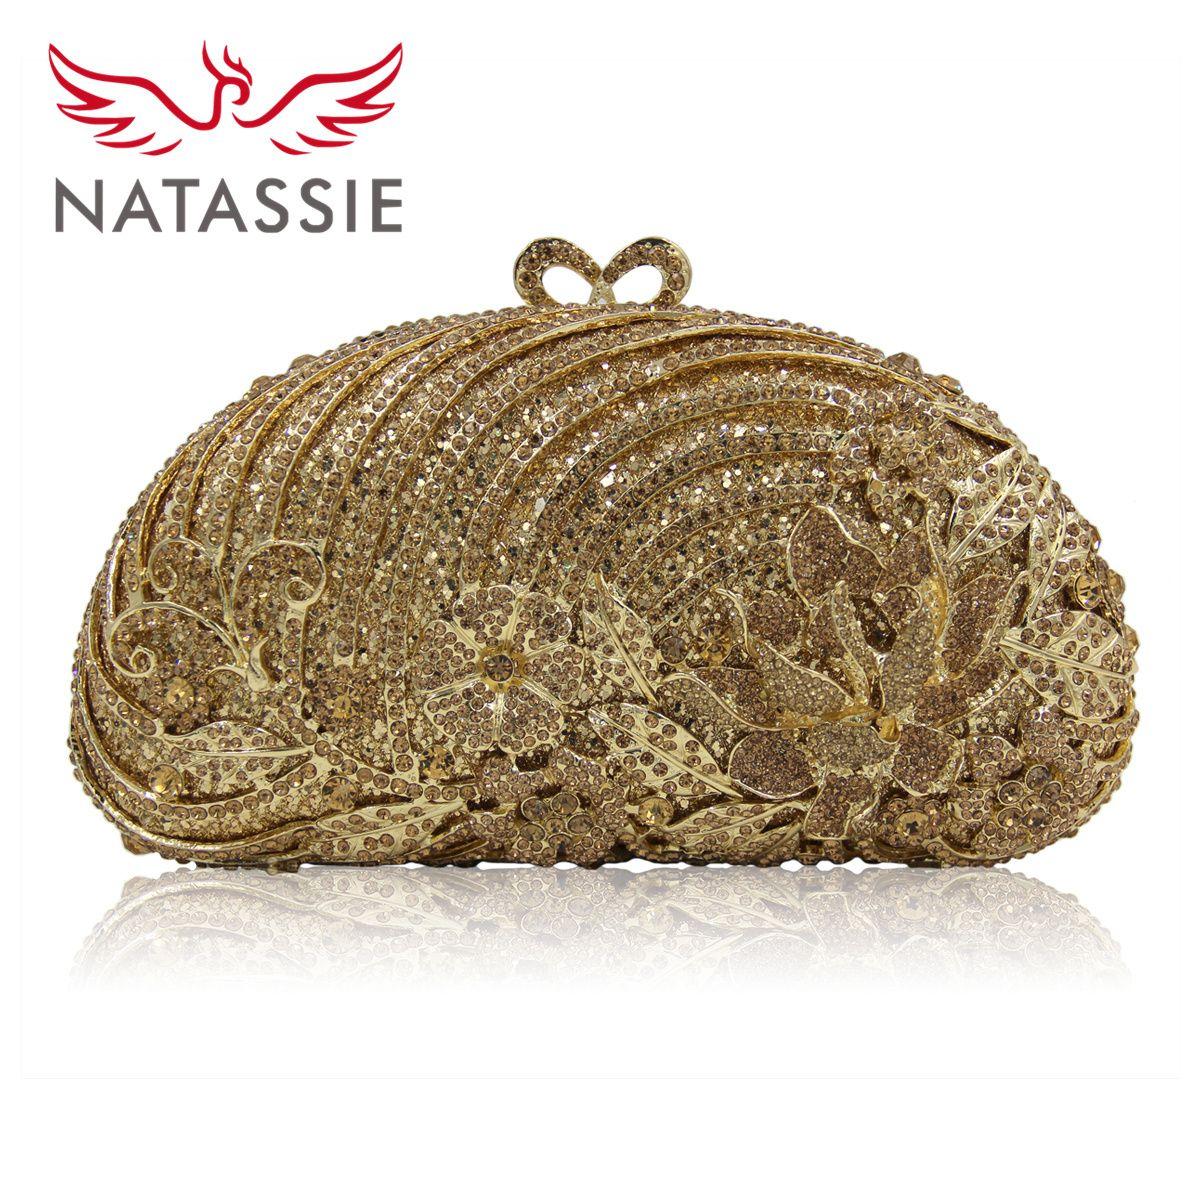 Natassie Women Flower Crystal Bags Las Evening Bag Female Clutches Purses